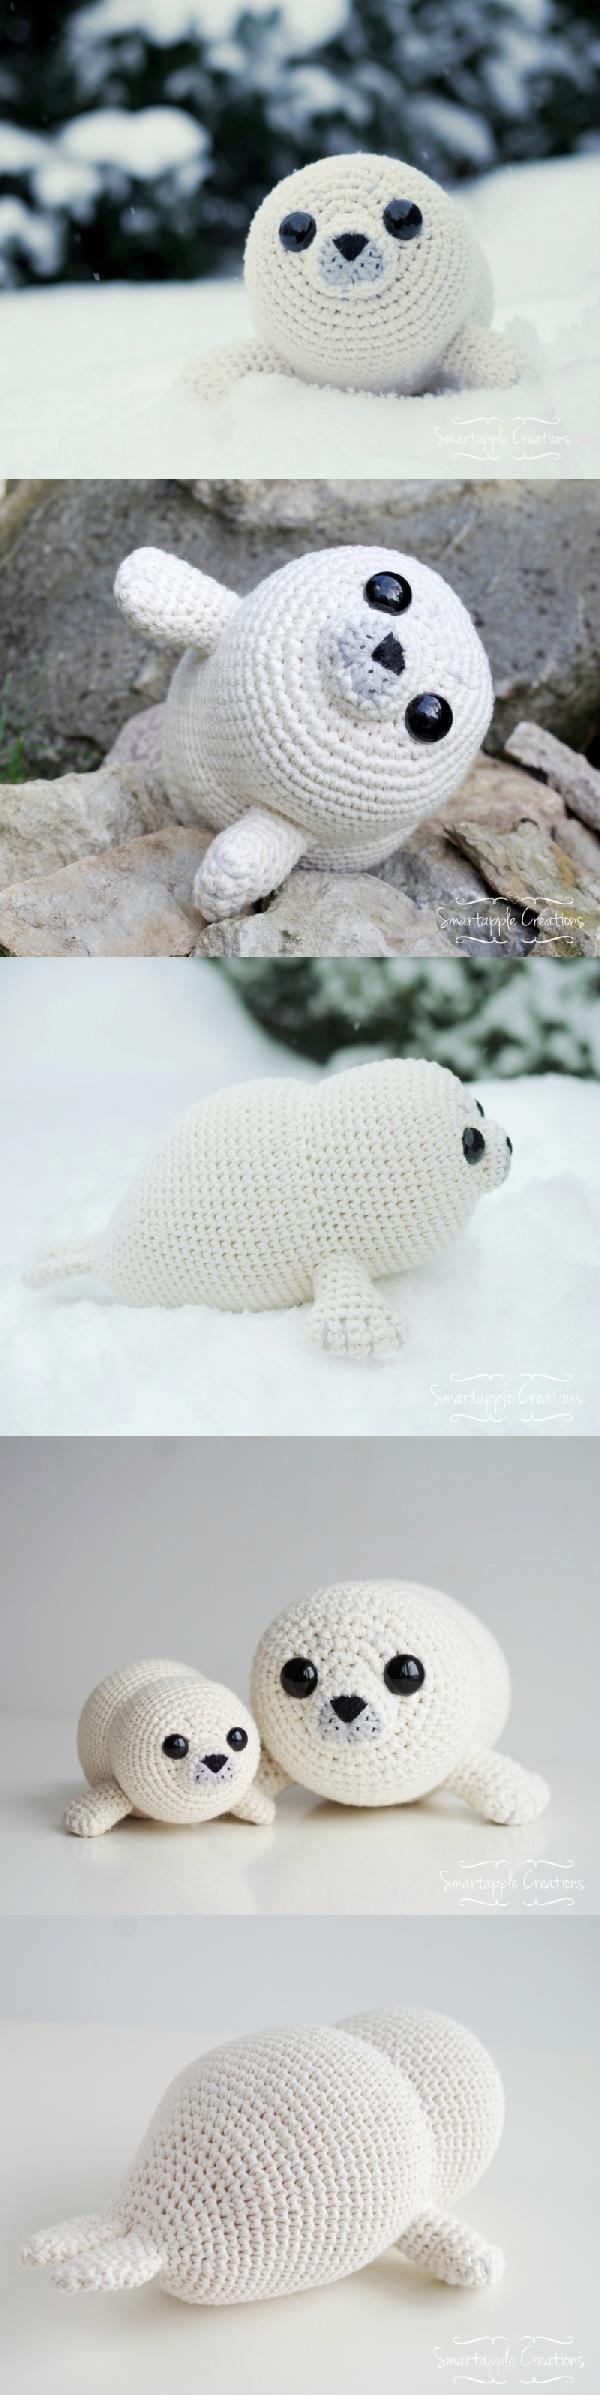 Bubbly The Baby Seal Amigurumi Pattern | 52 arigurumi of the year ...